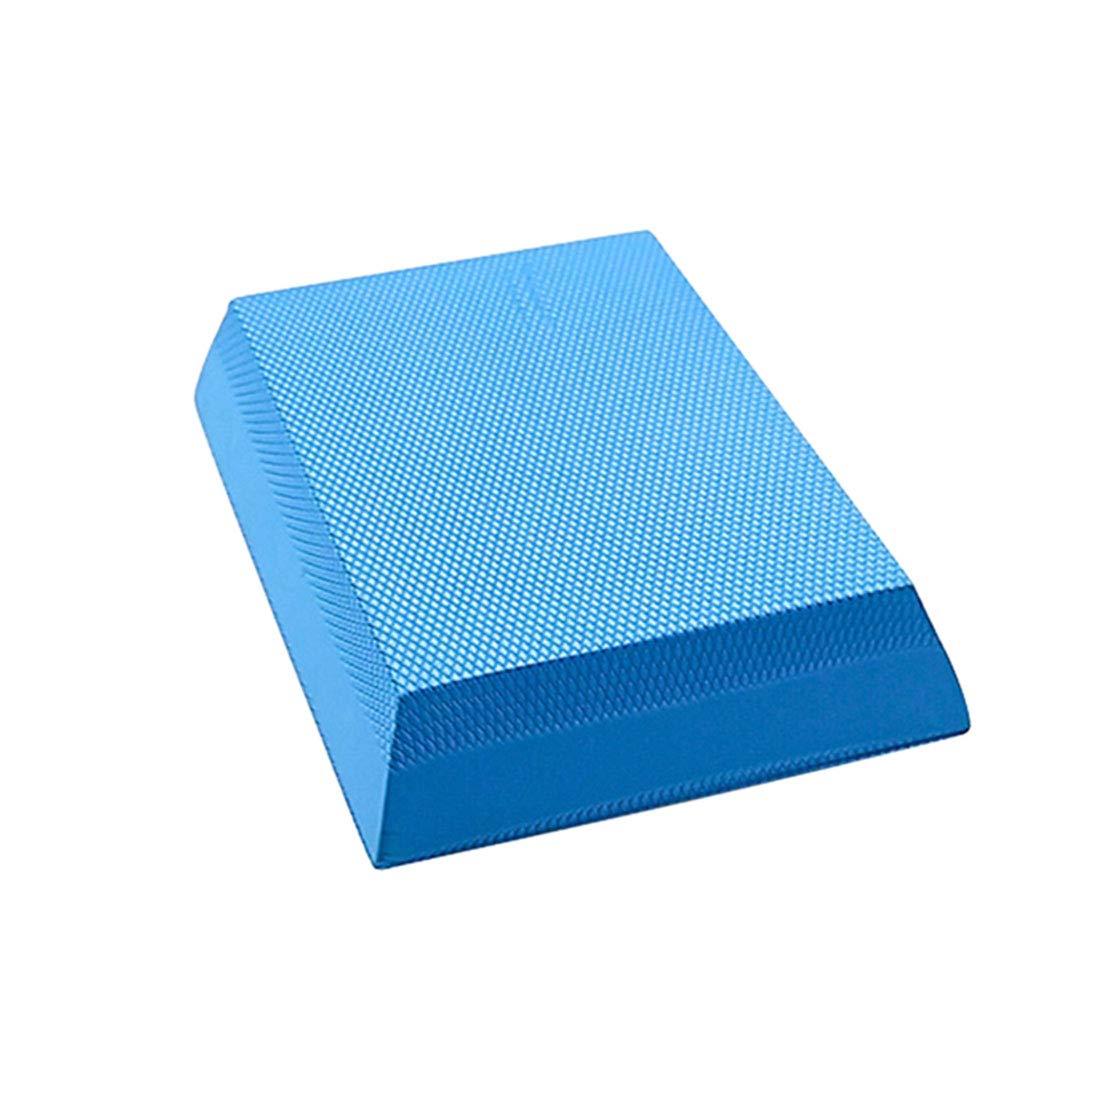 Amazon.com : Freahap Yoga Brick Yoga Balance Pad Echelon ...